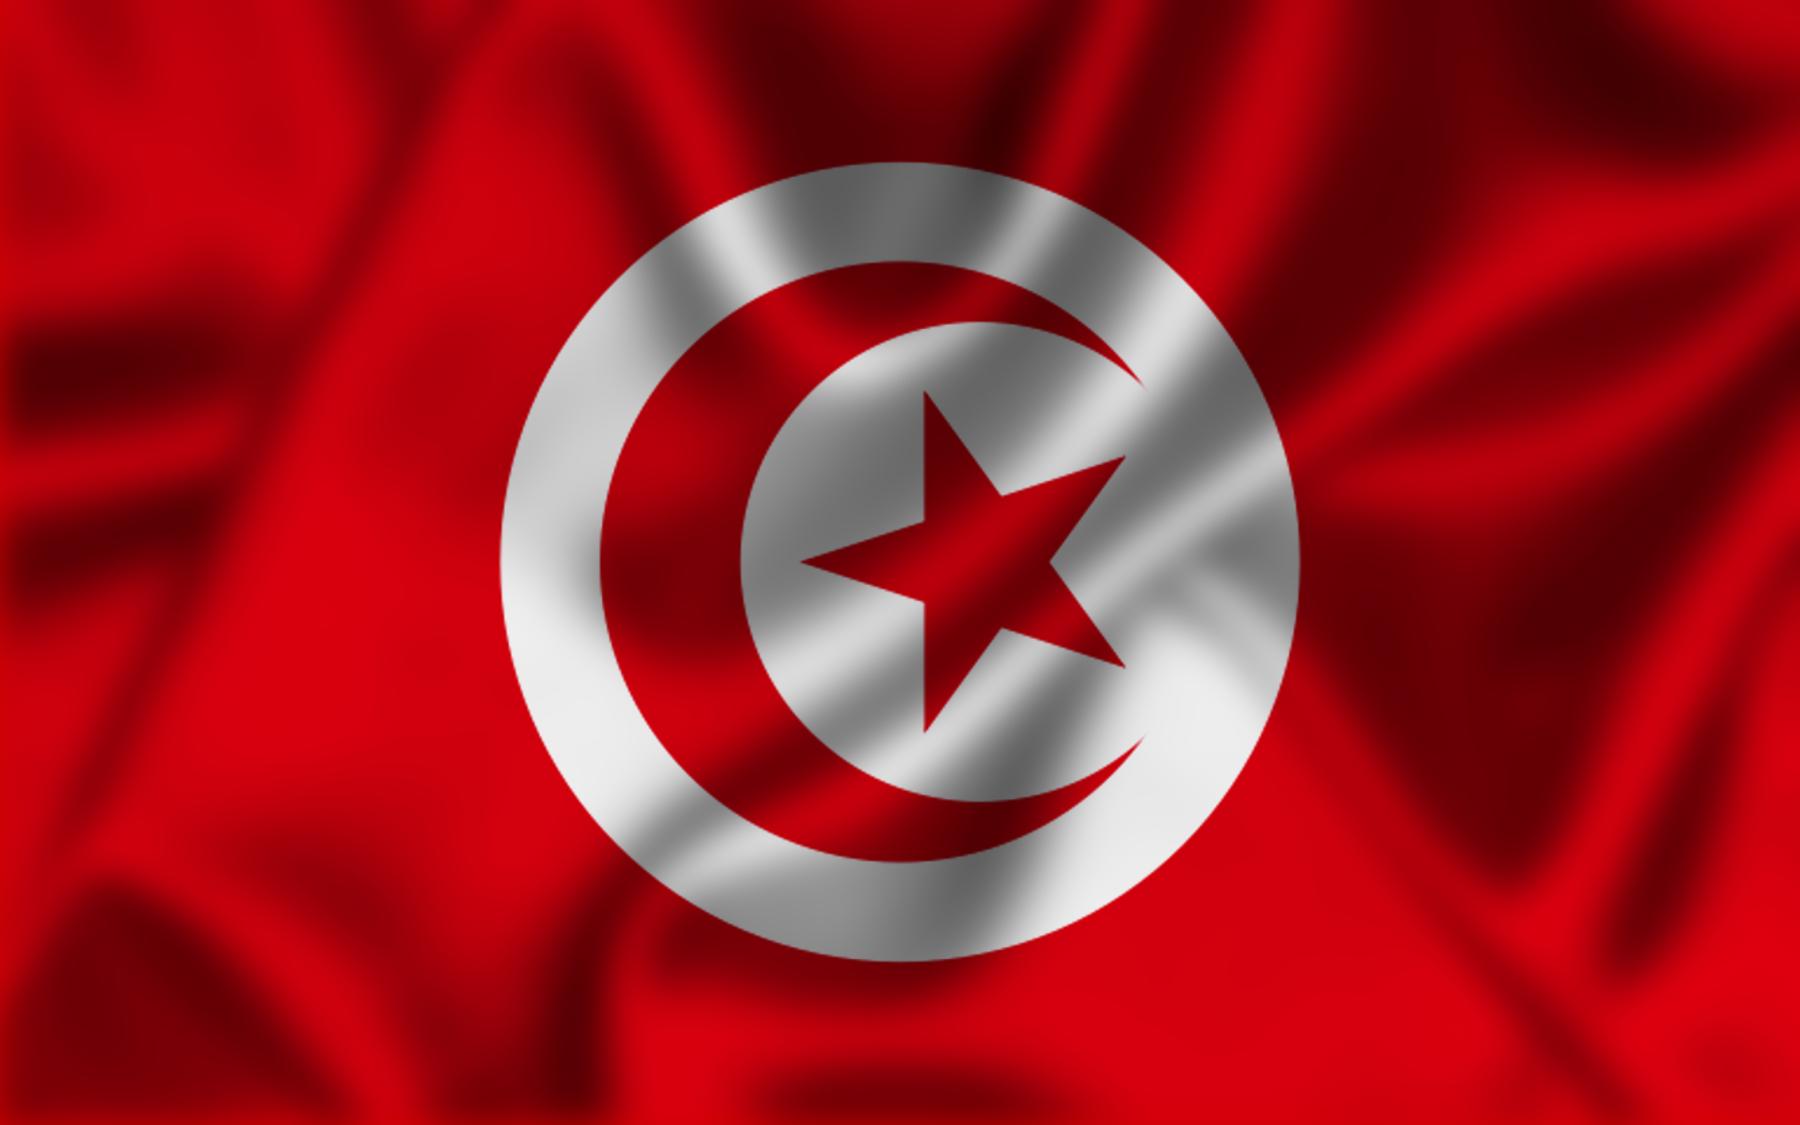 File:علم تونس، غير رسمي.jpg